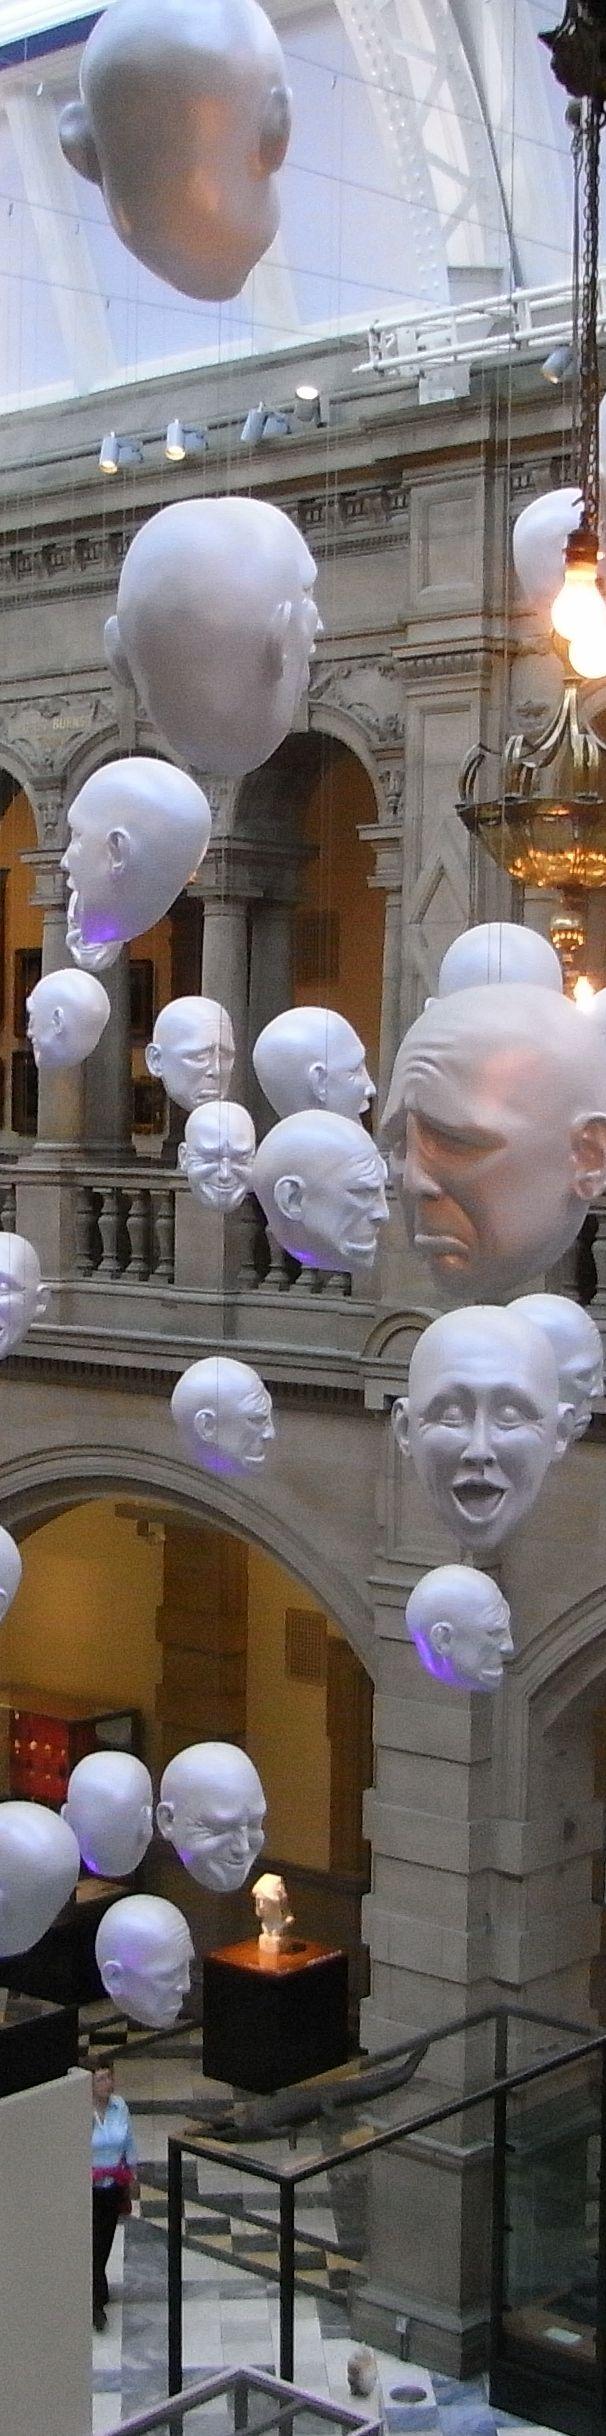 Hanging Heads, Kelvingrove Art Gallery and Museum, Glasgow